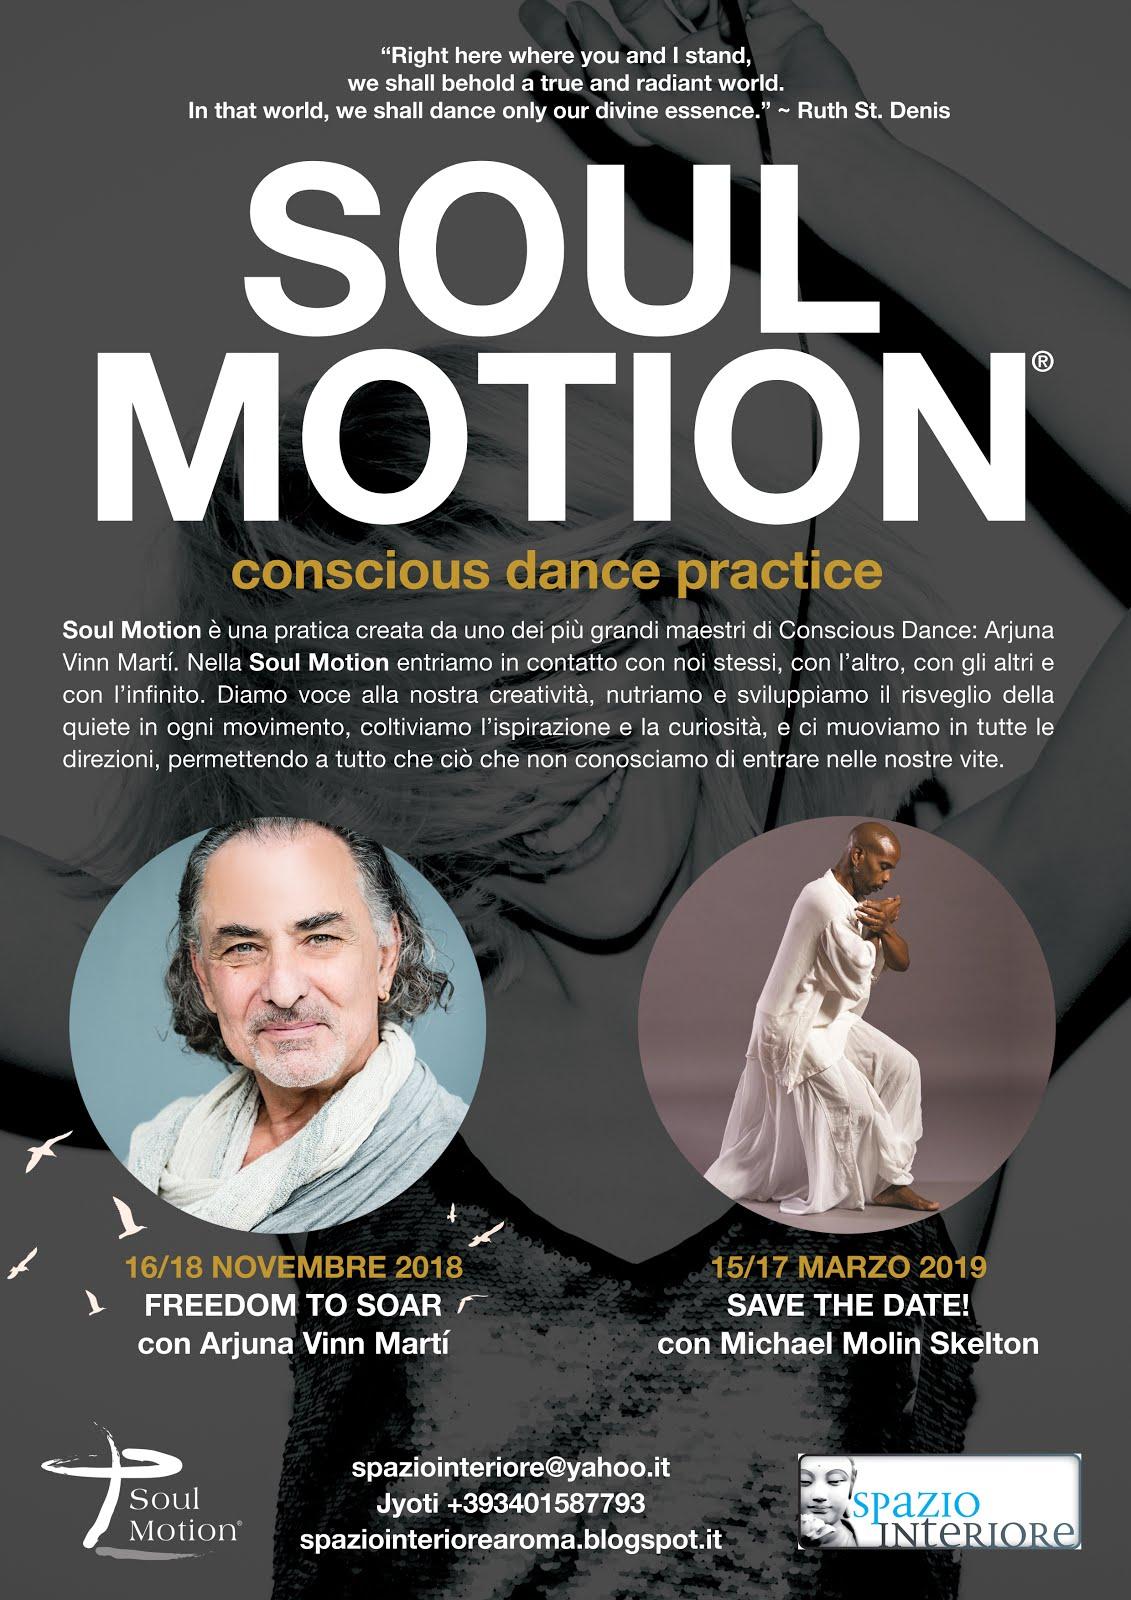 Soul Motion con Vinn Arjuna Marti e Michael Molin Skelton